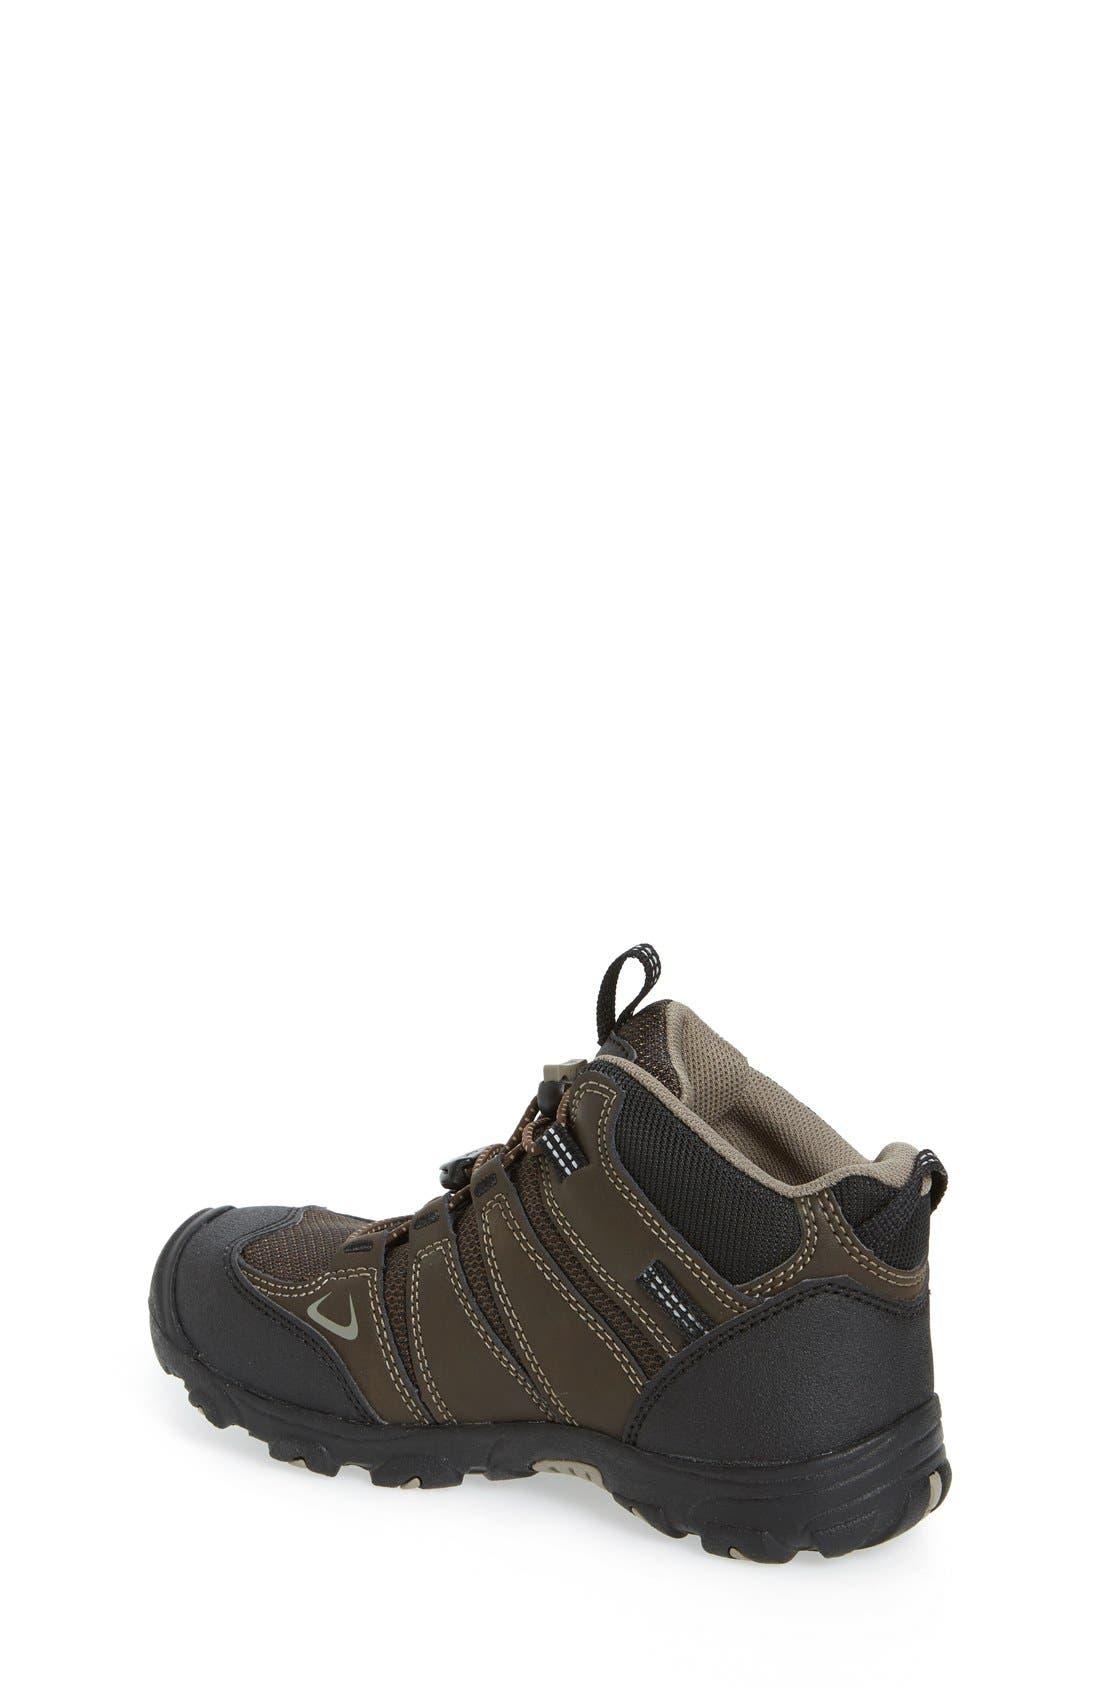 'Oakridge' Waterproof Hiking Boot,                             Alternate thumbnail 2, color,                             Brown